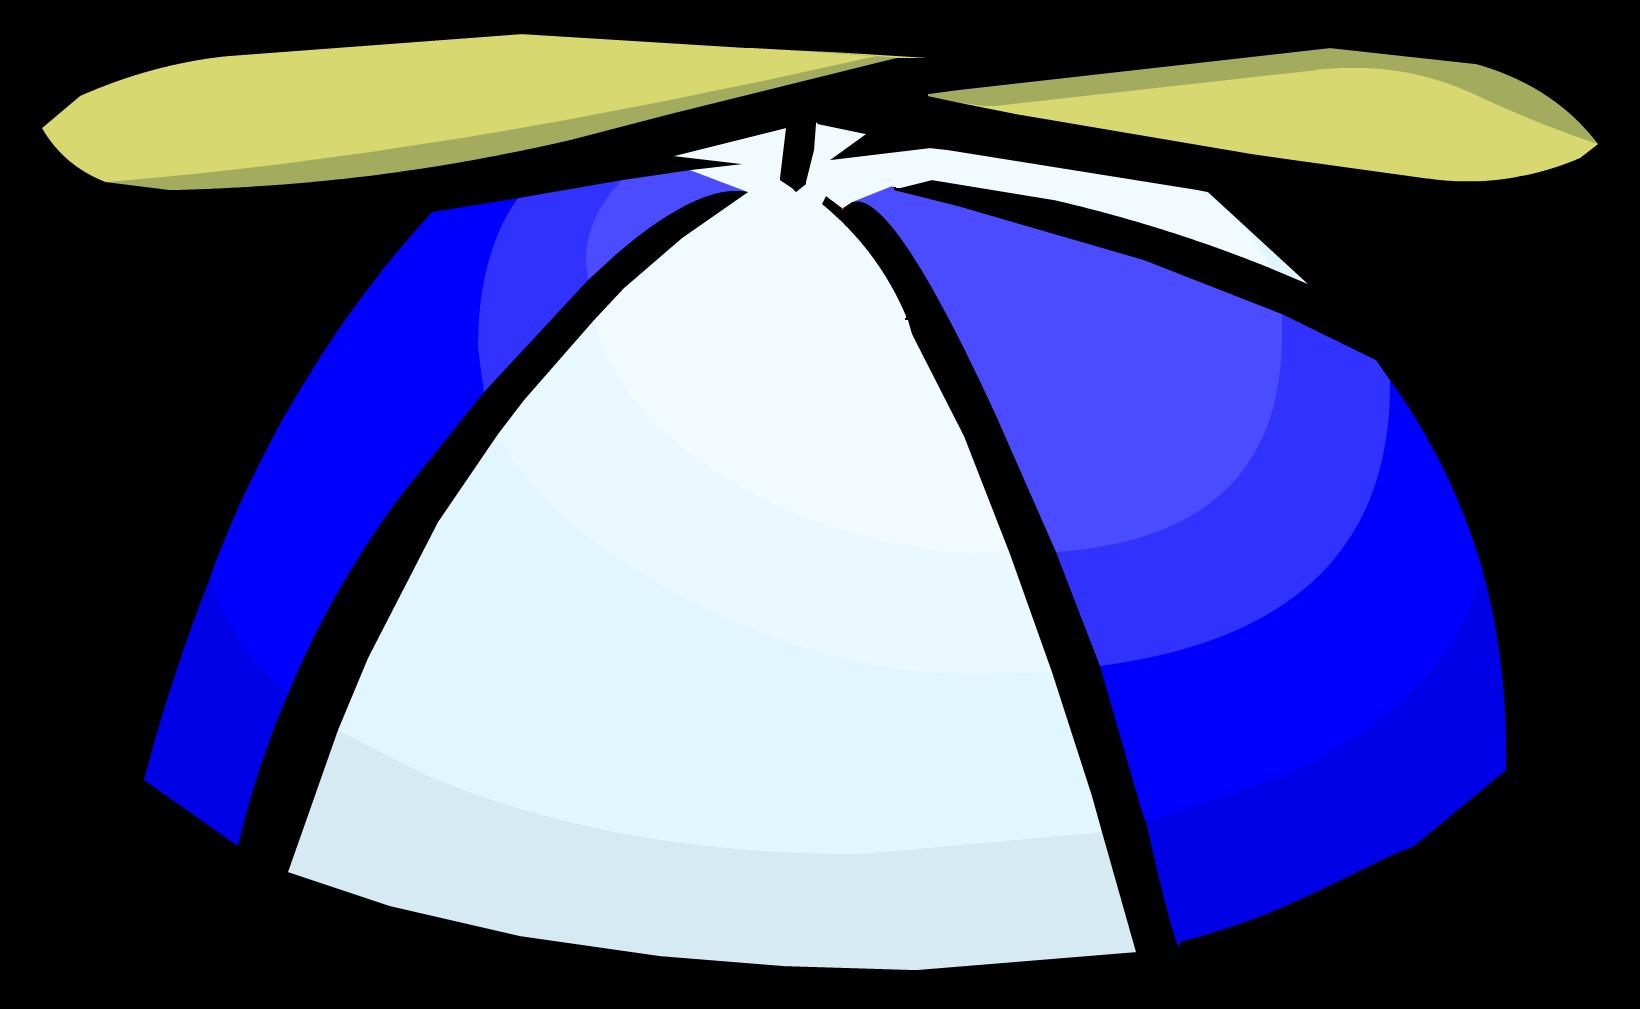 Image result for spinner hat free images